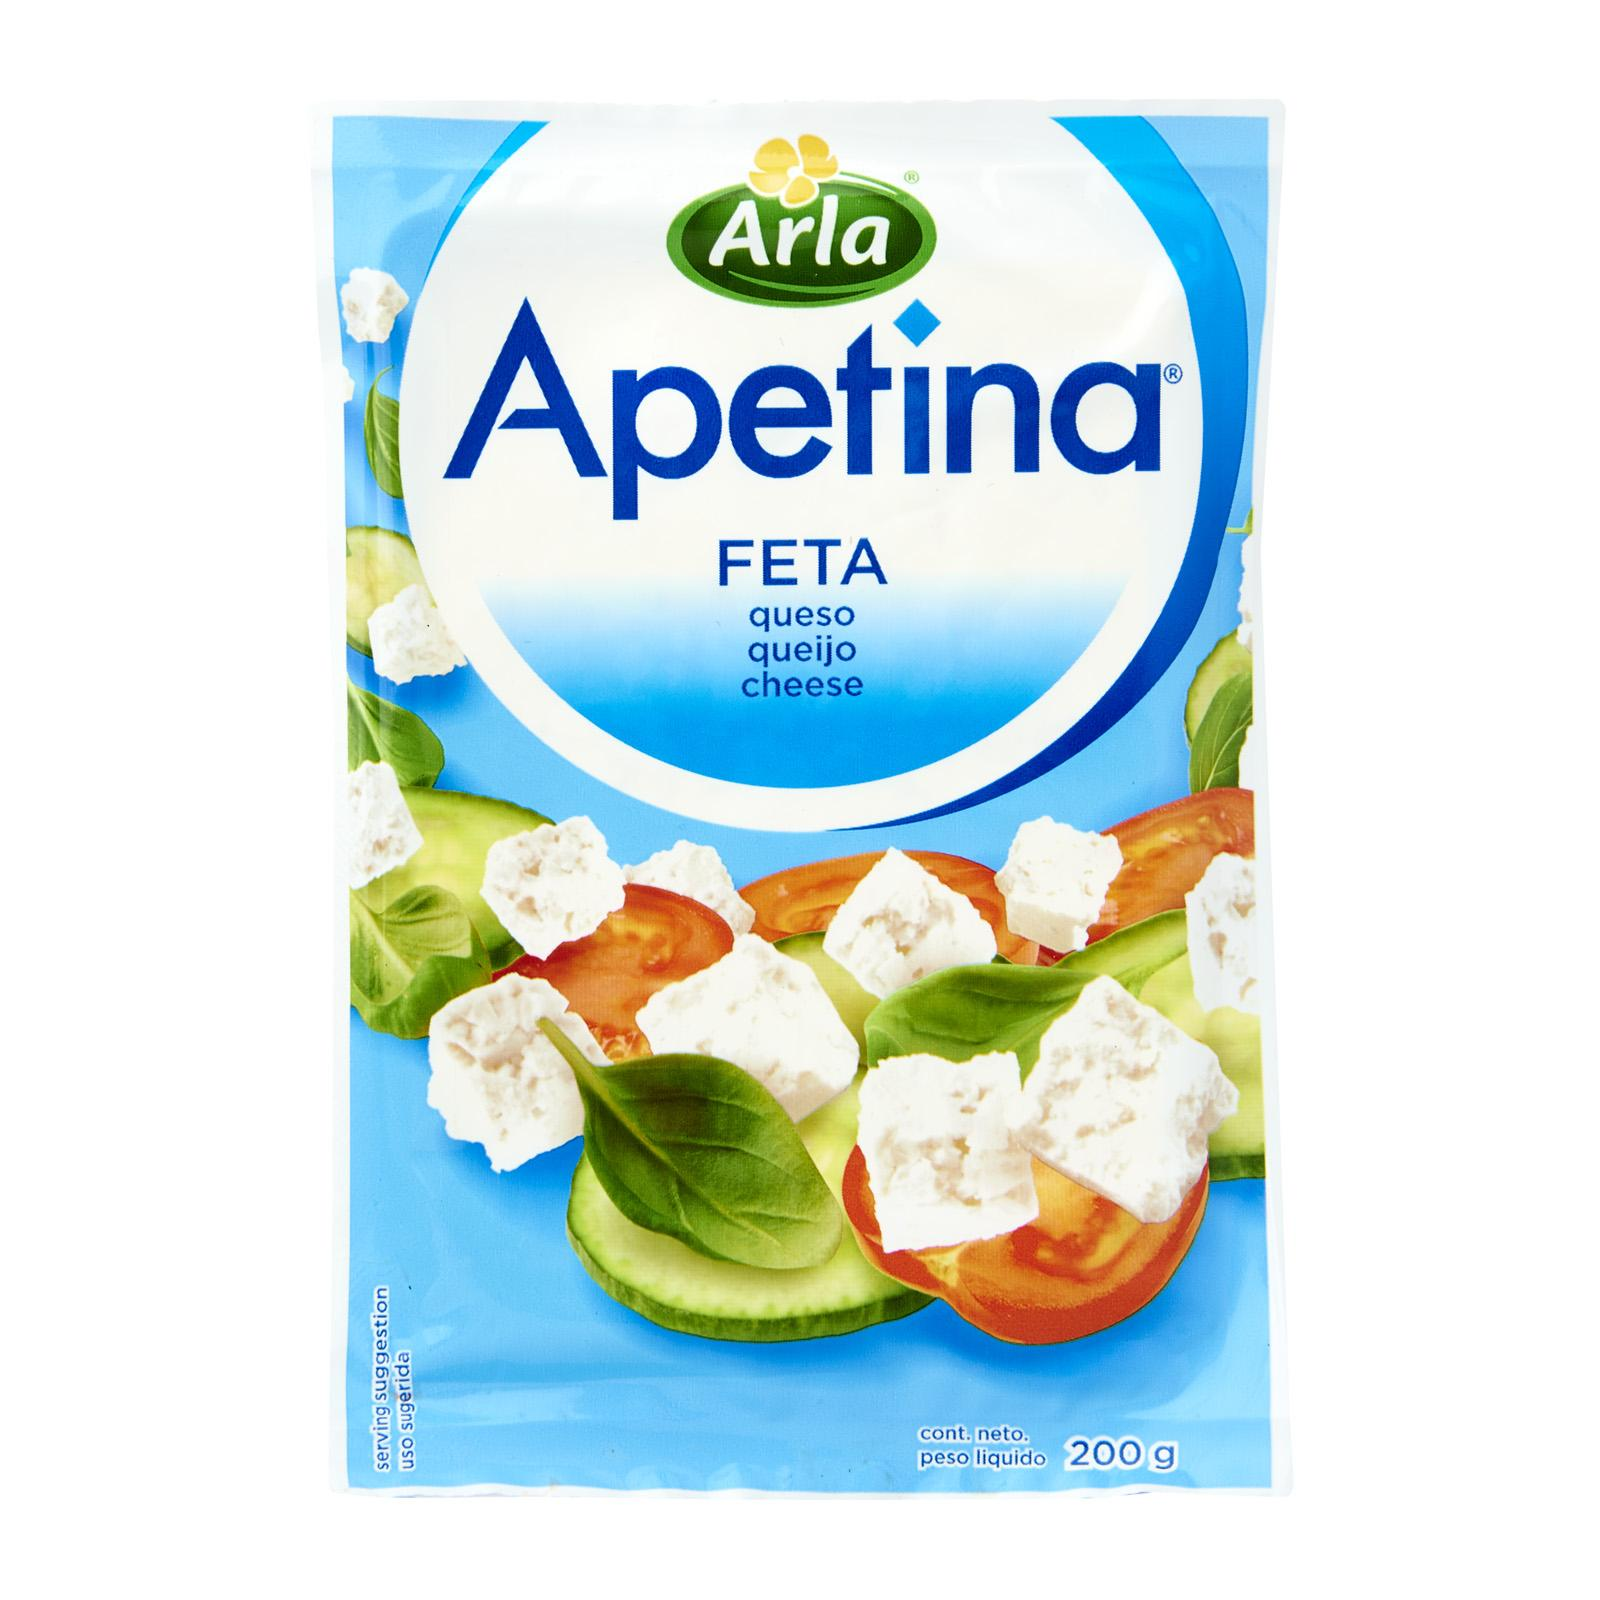 Apetina In Block Cheese By Redmart.